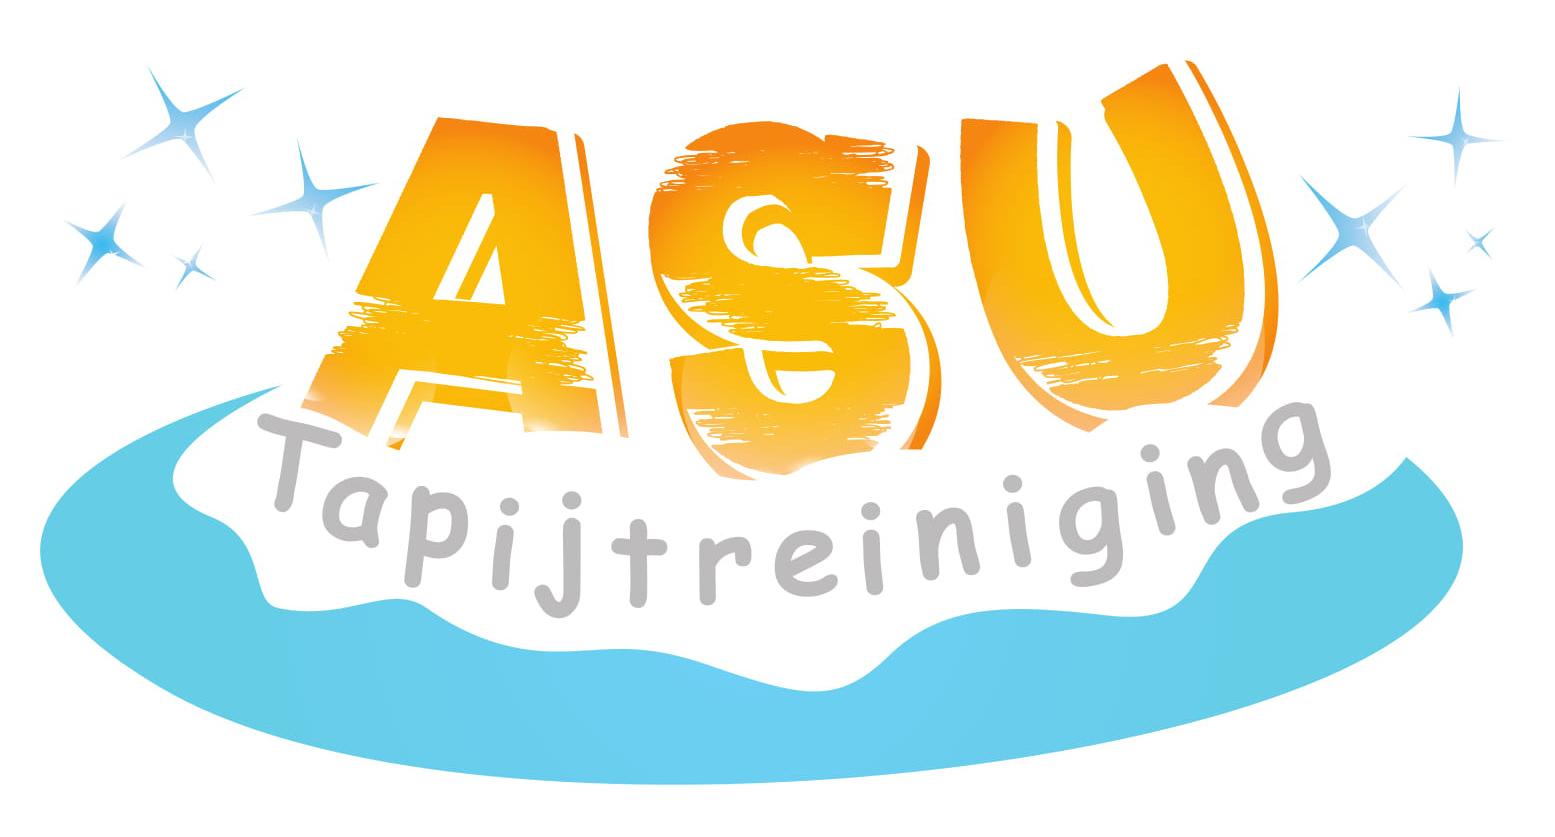 ASU-Tapijtreining